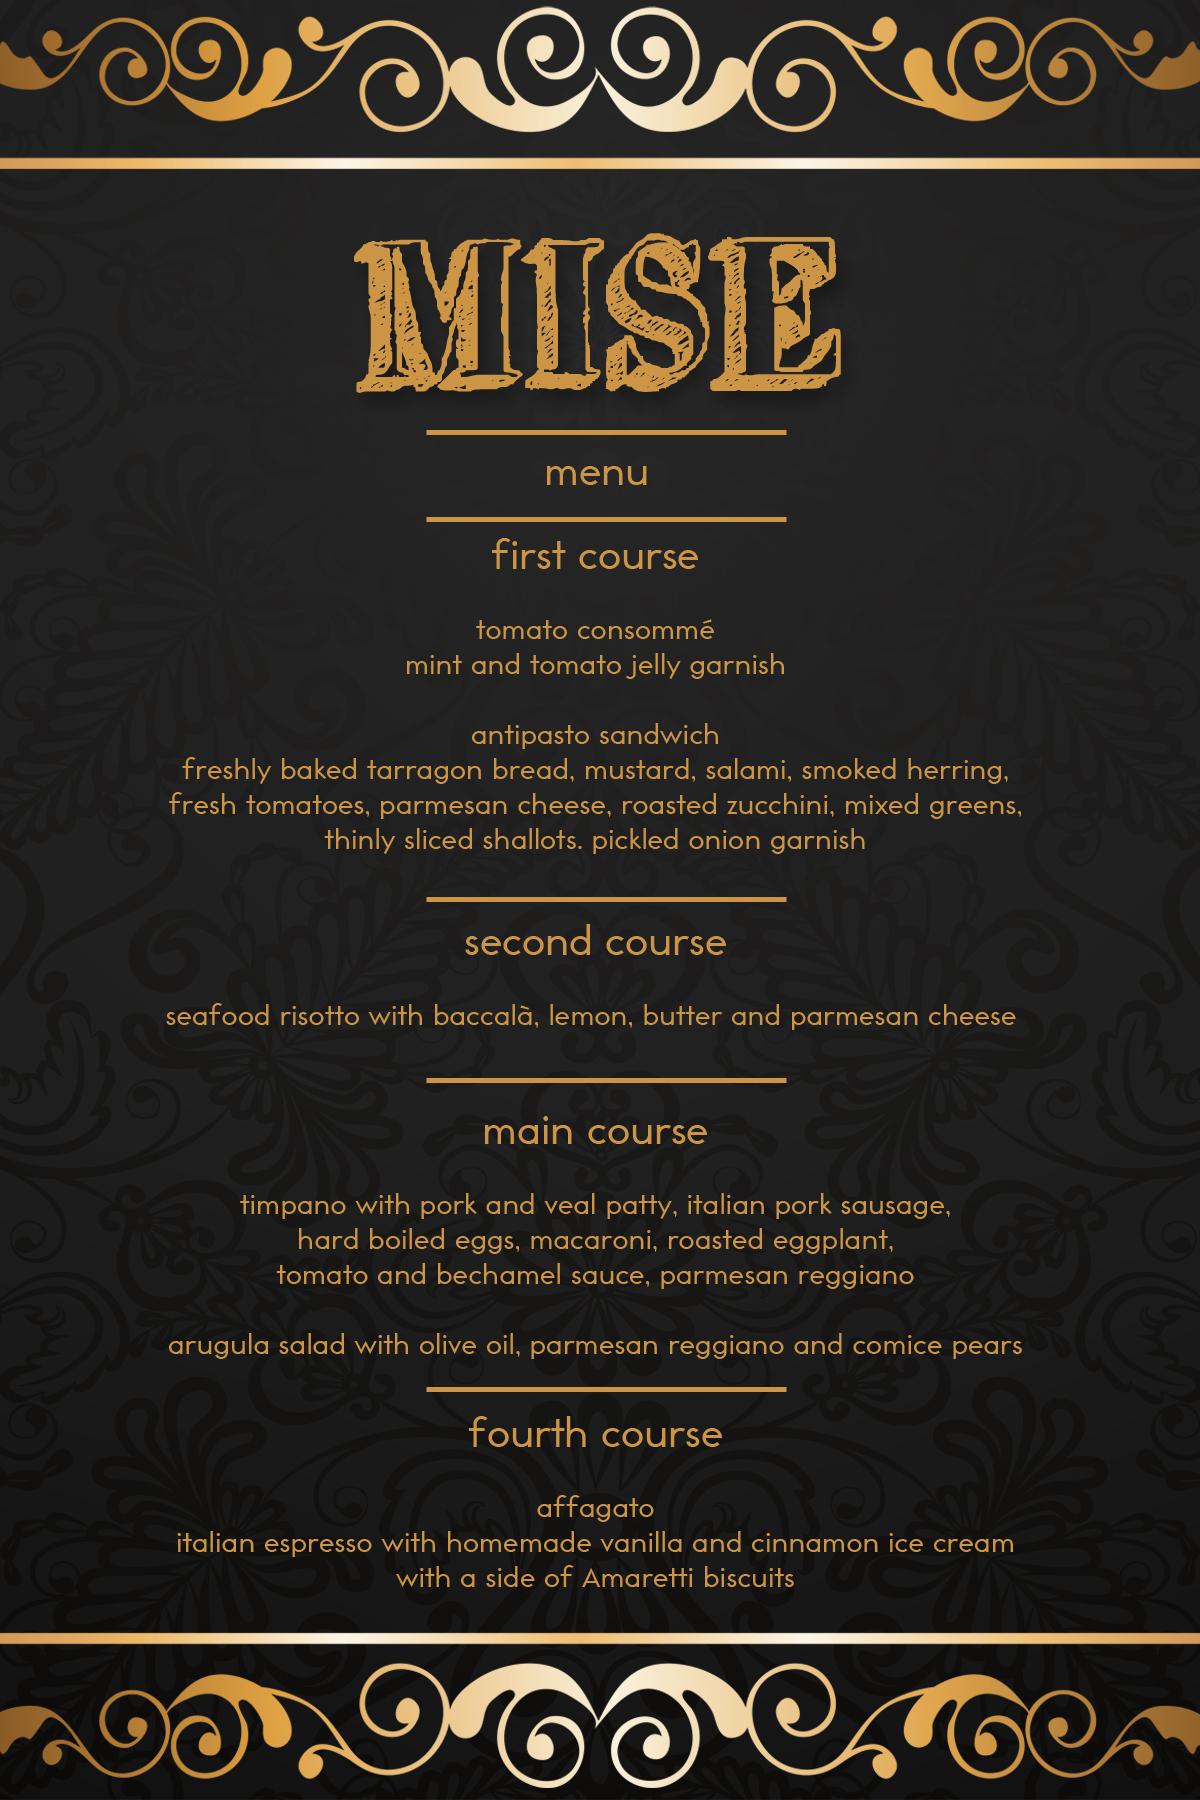 mise menu big night